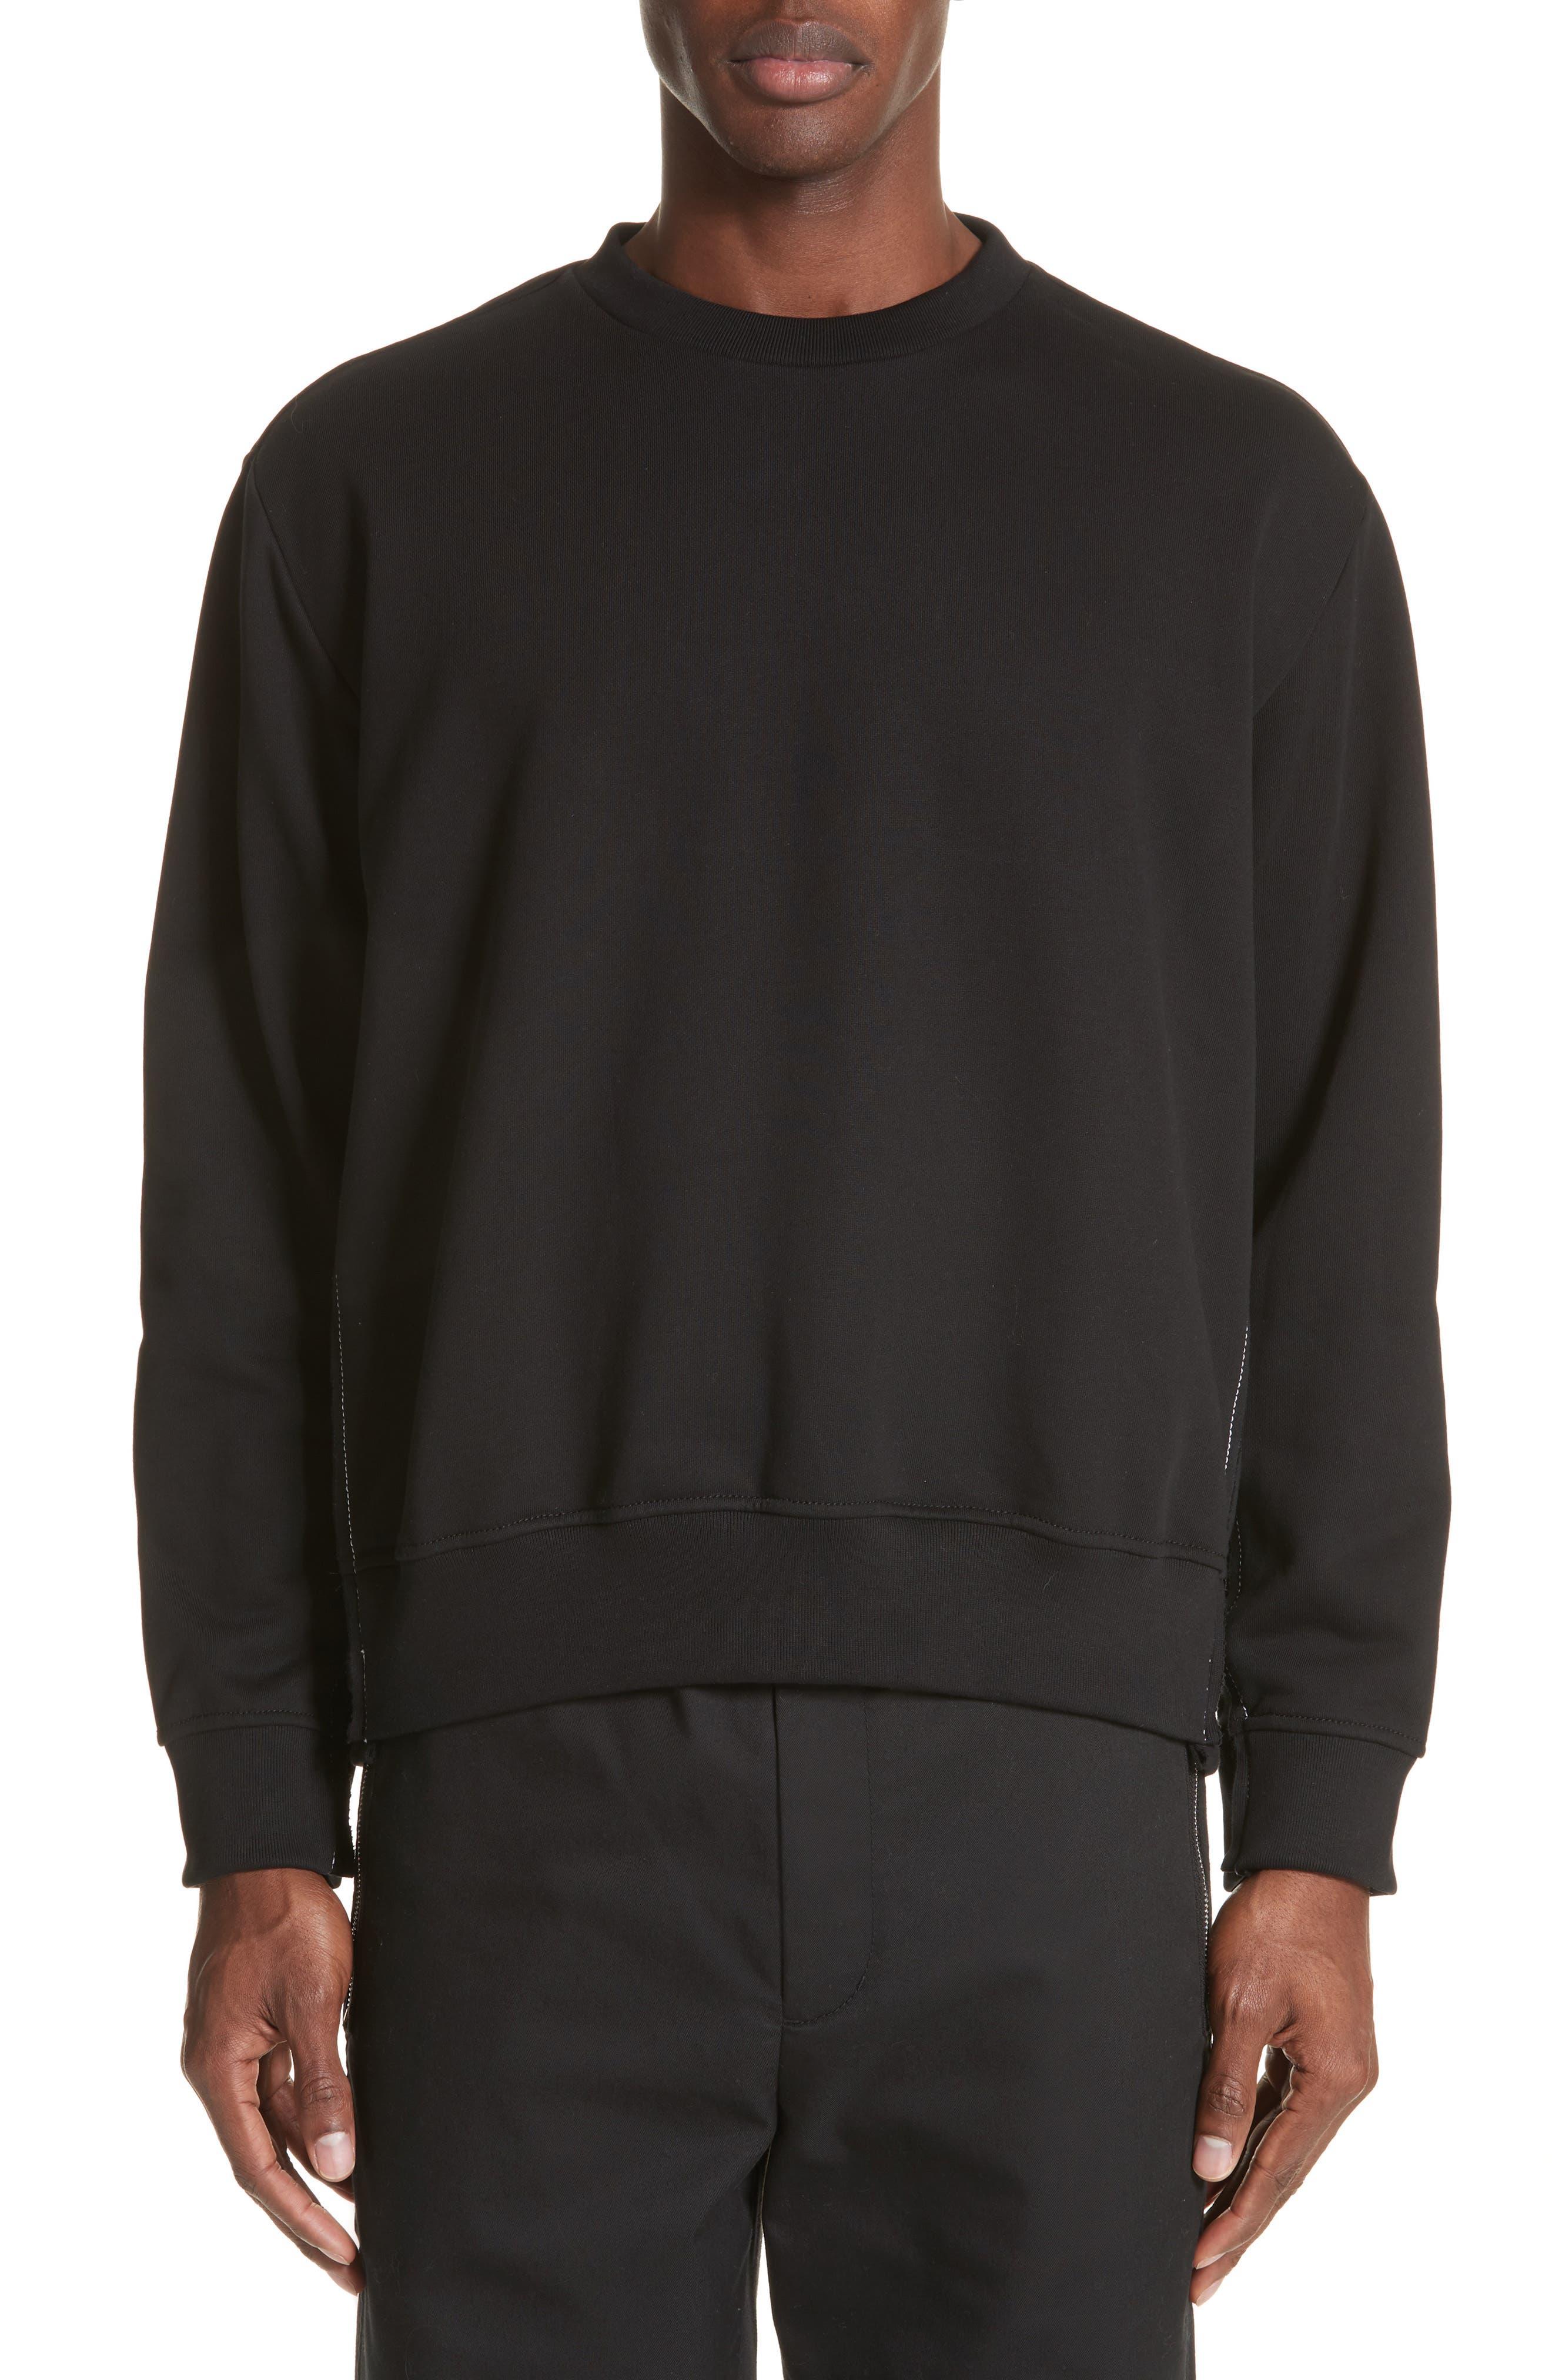 Reconstructed Crewneck Sweatshirt,                             Main thumbnail 1, color,                             001